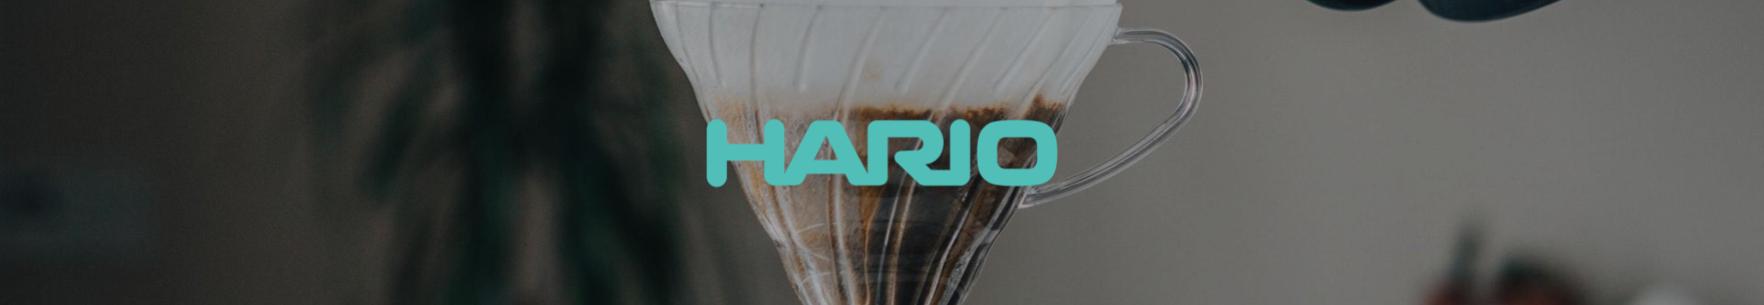 Hario V60 Drippers til filterbryg